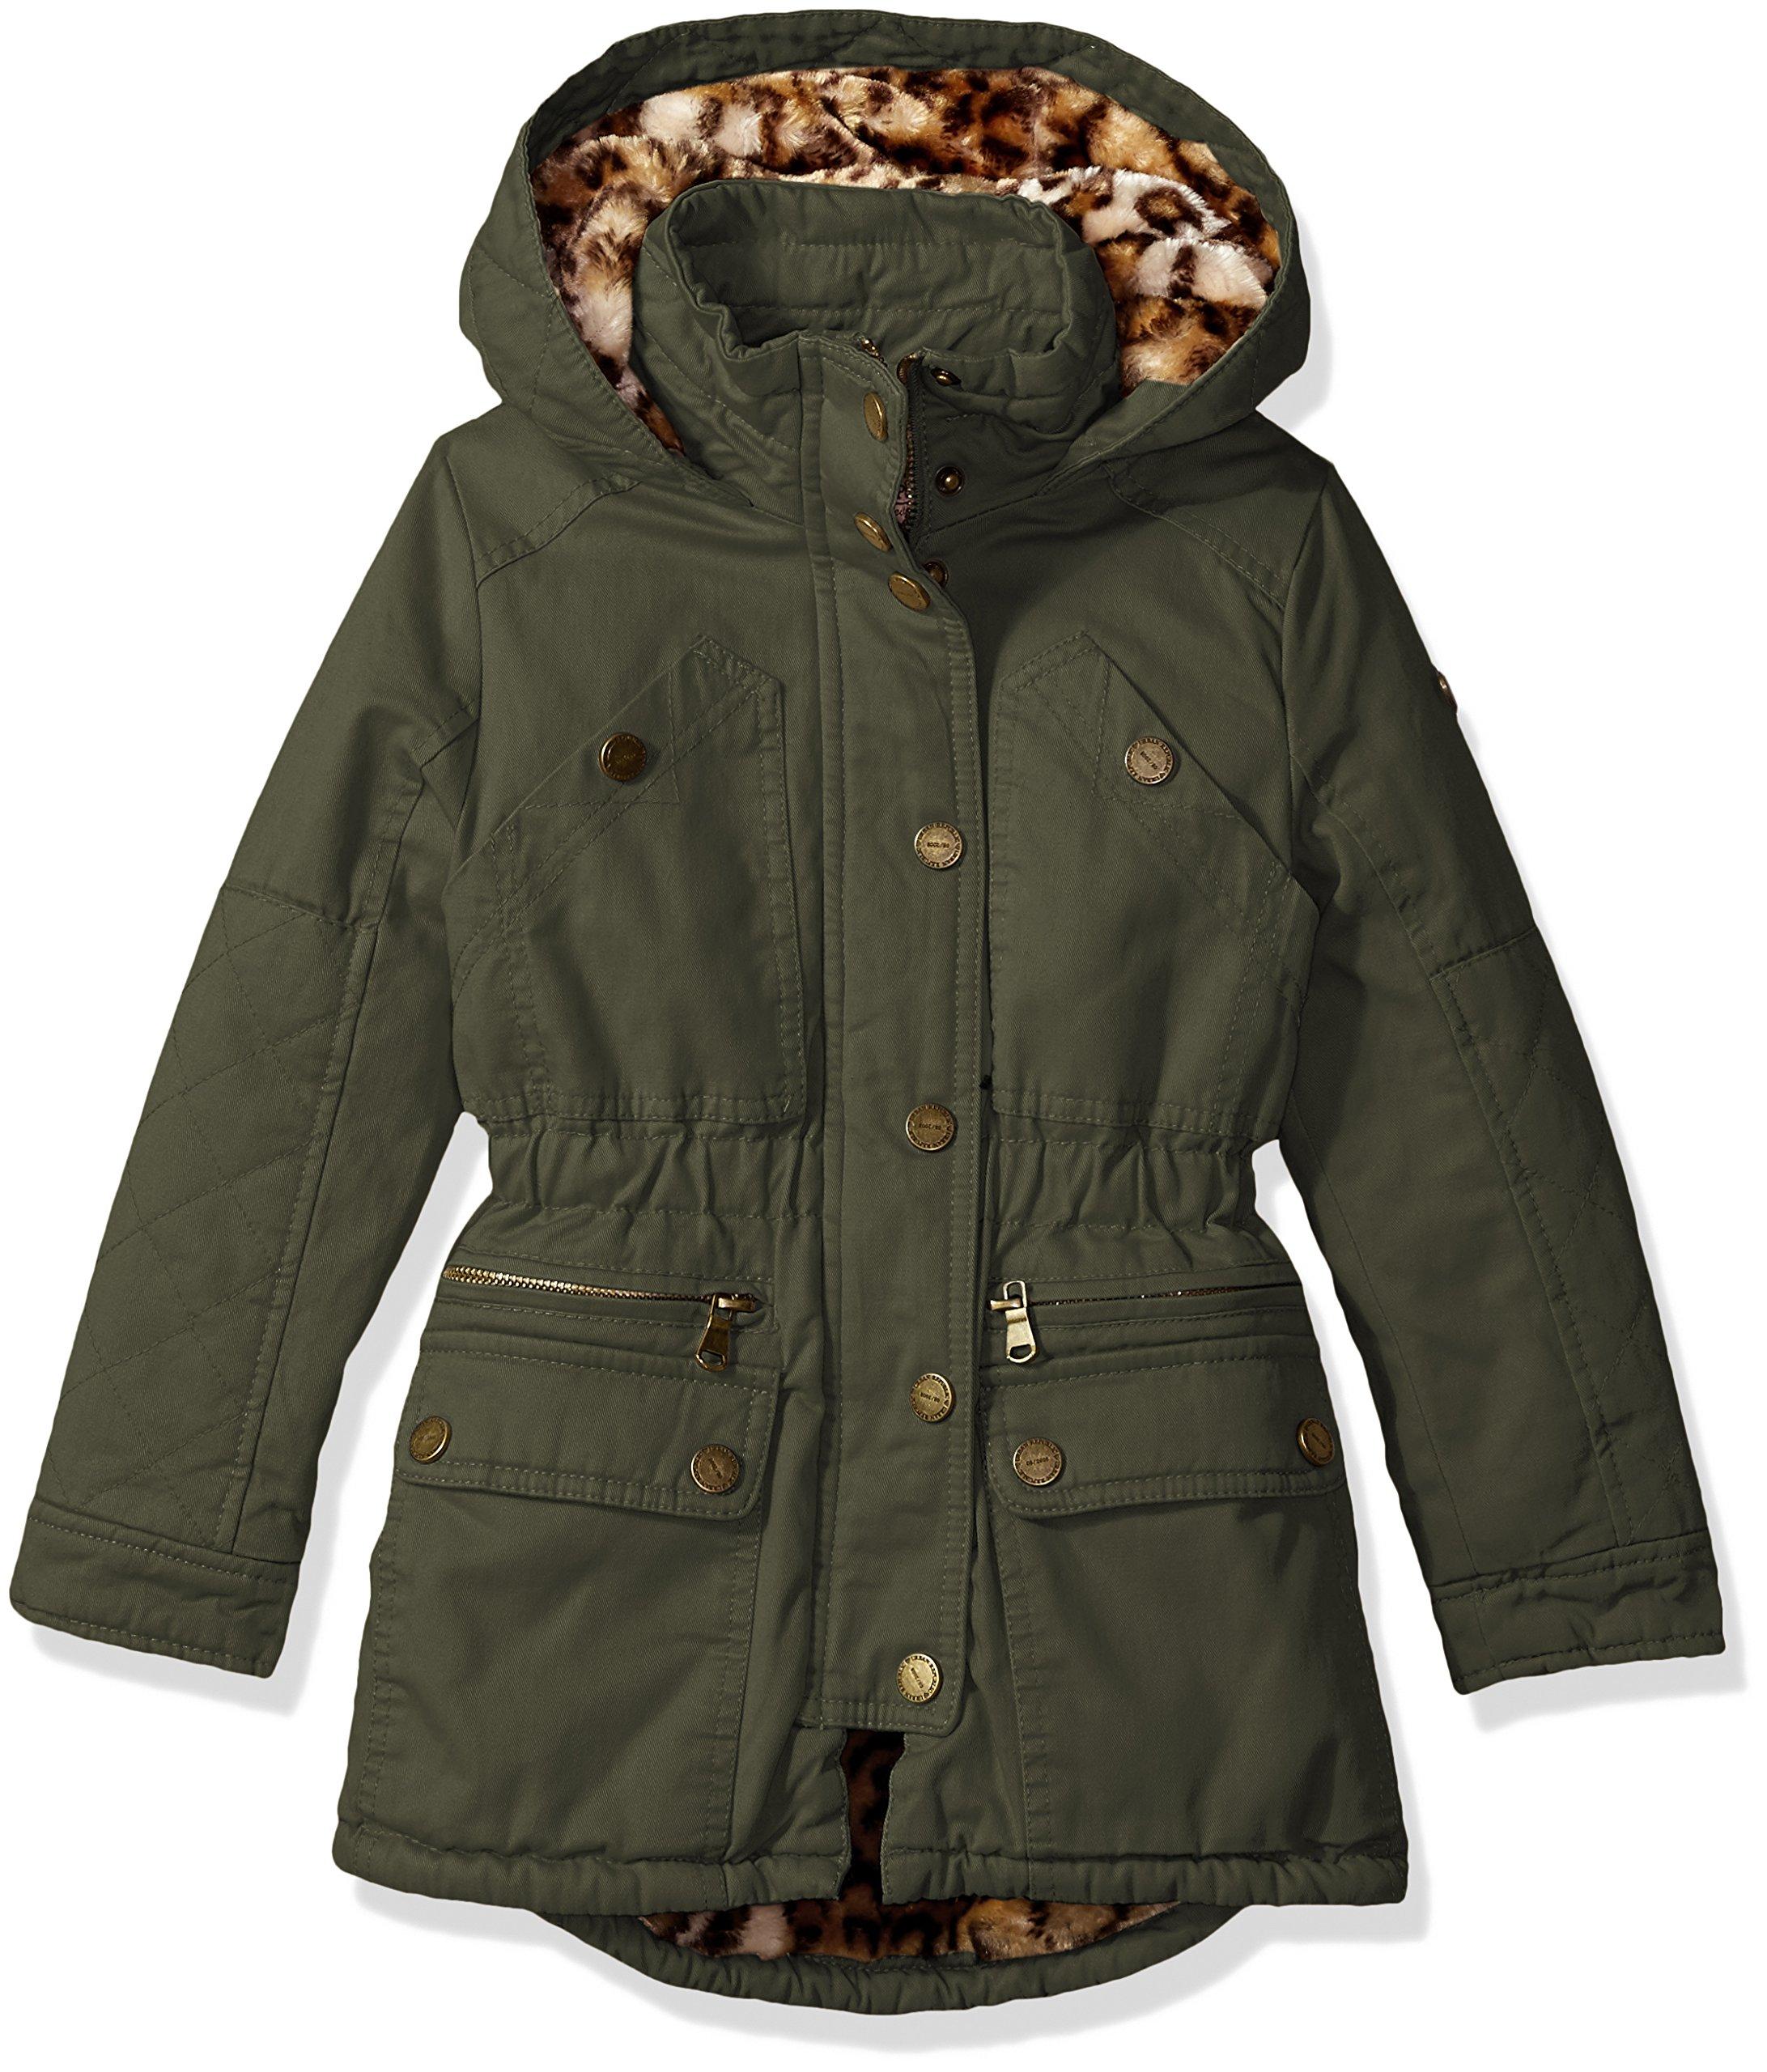 Urban Republic Little Girls' Ur Cotton Twill Jacket, Dusty Olive 5809KDL, 5/6